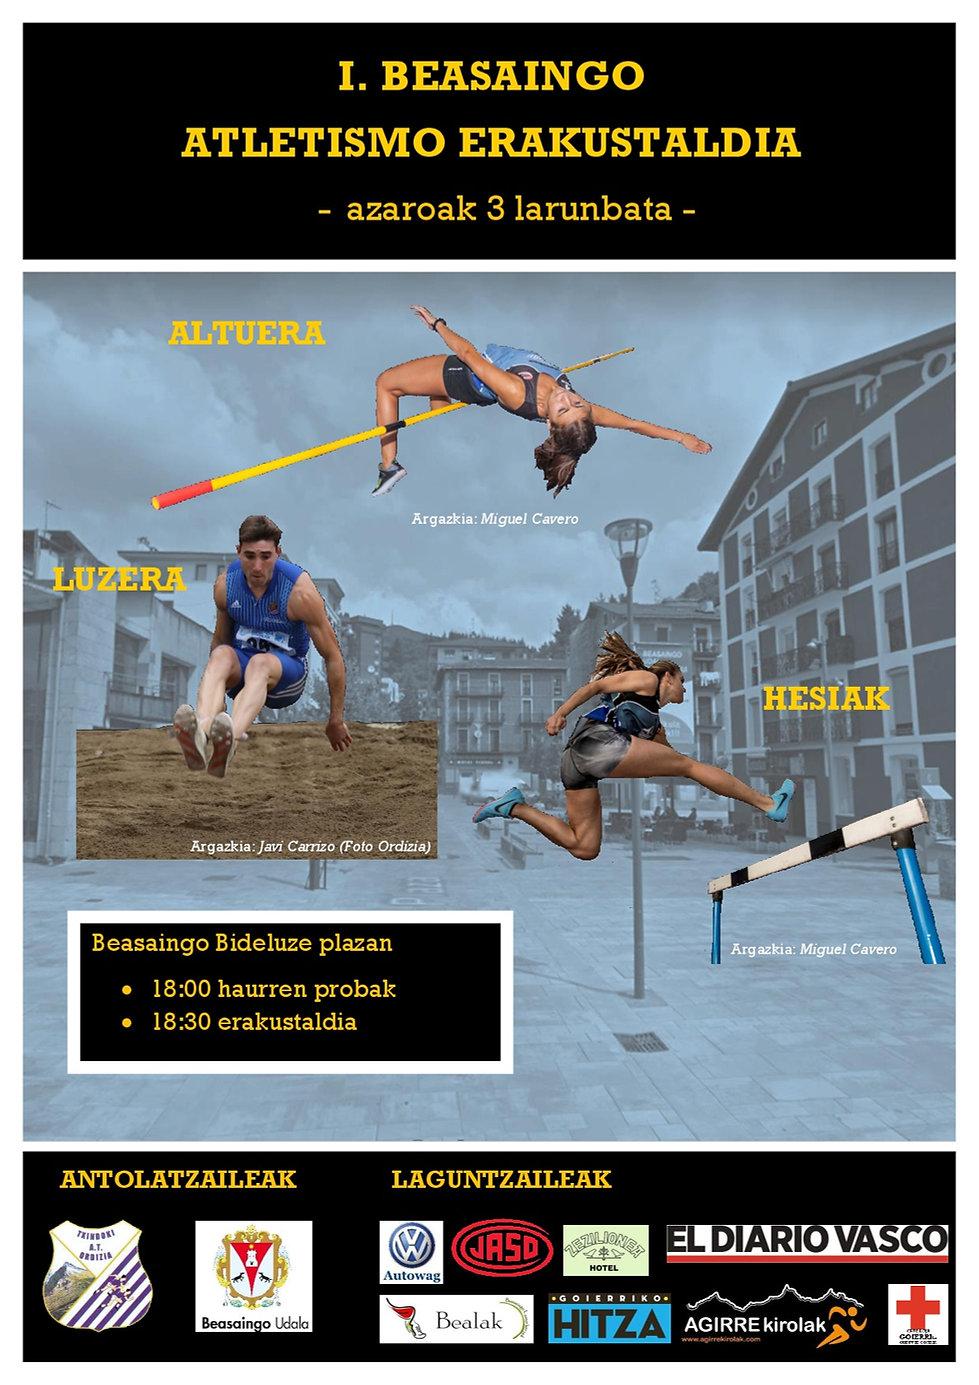 Atletismo erakustaldia 2018 (DV)-001.jpg